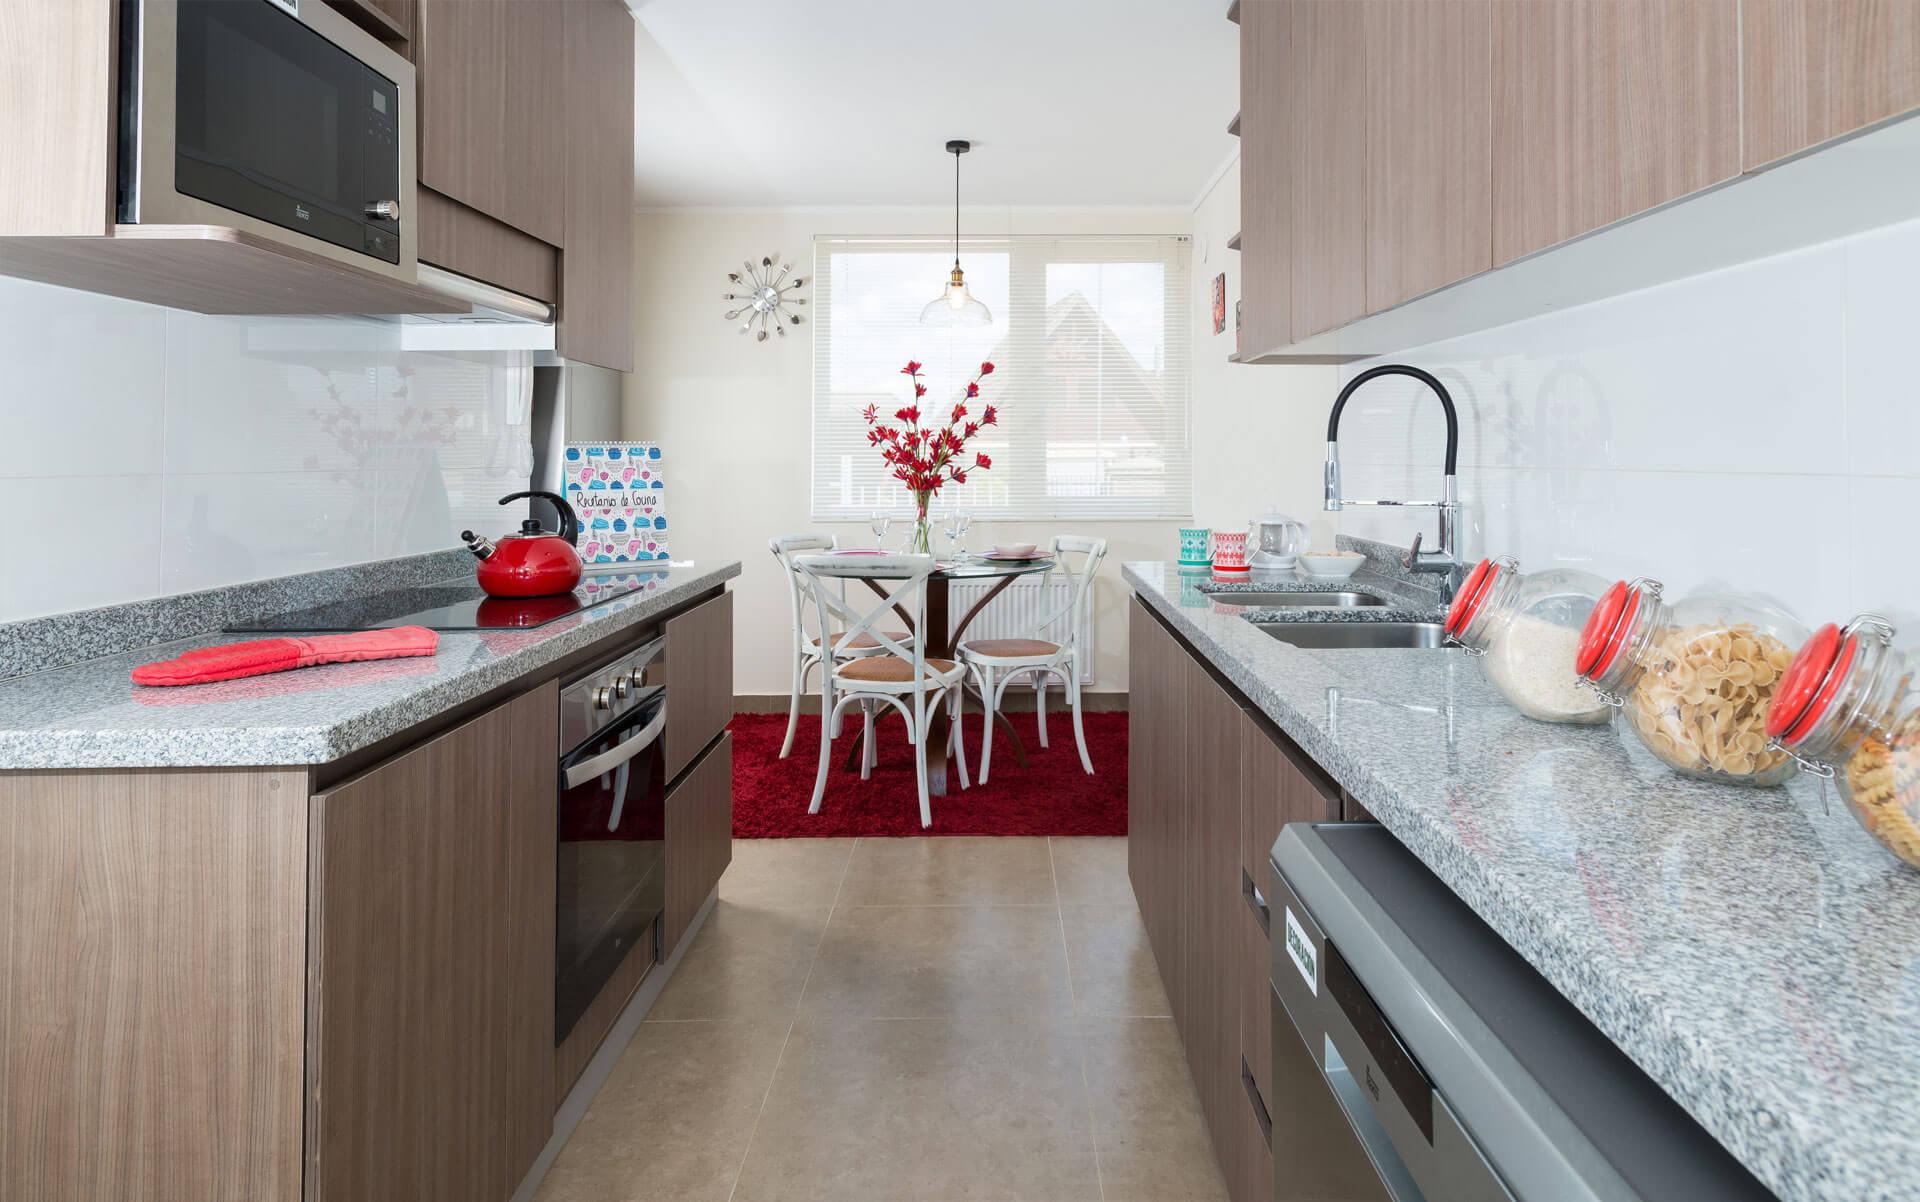 dubois-condominio-versalles-cocina01